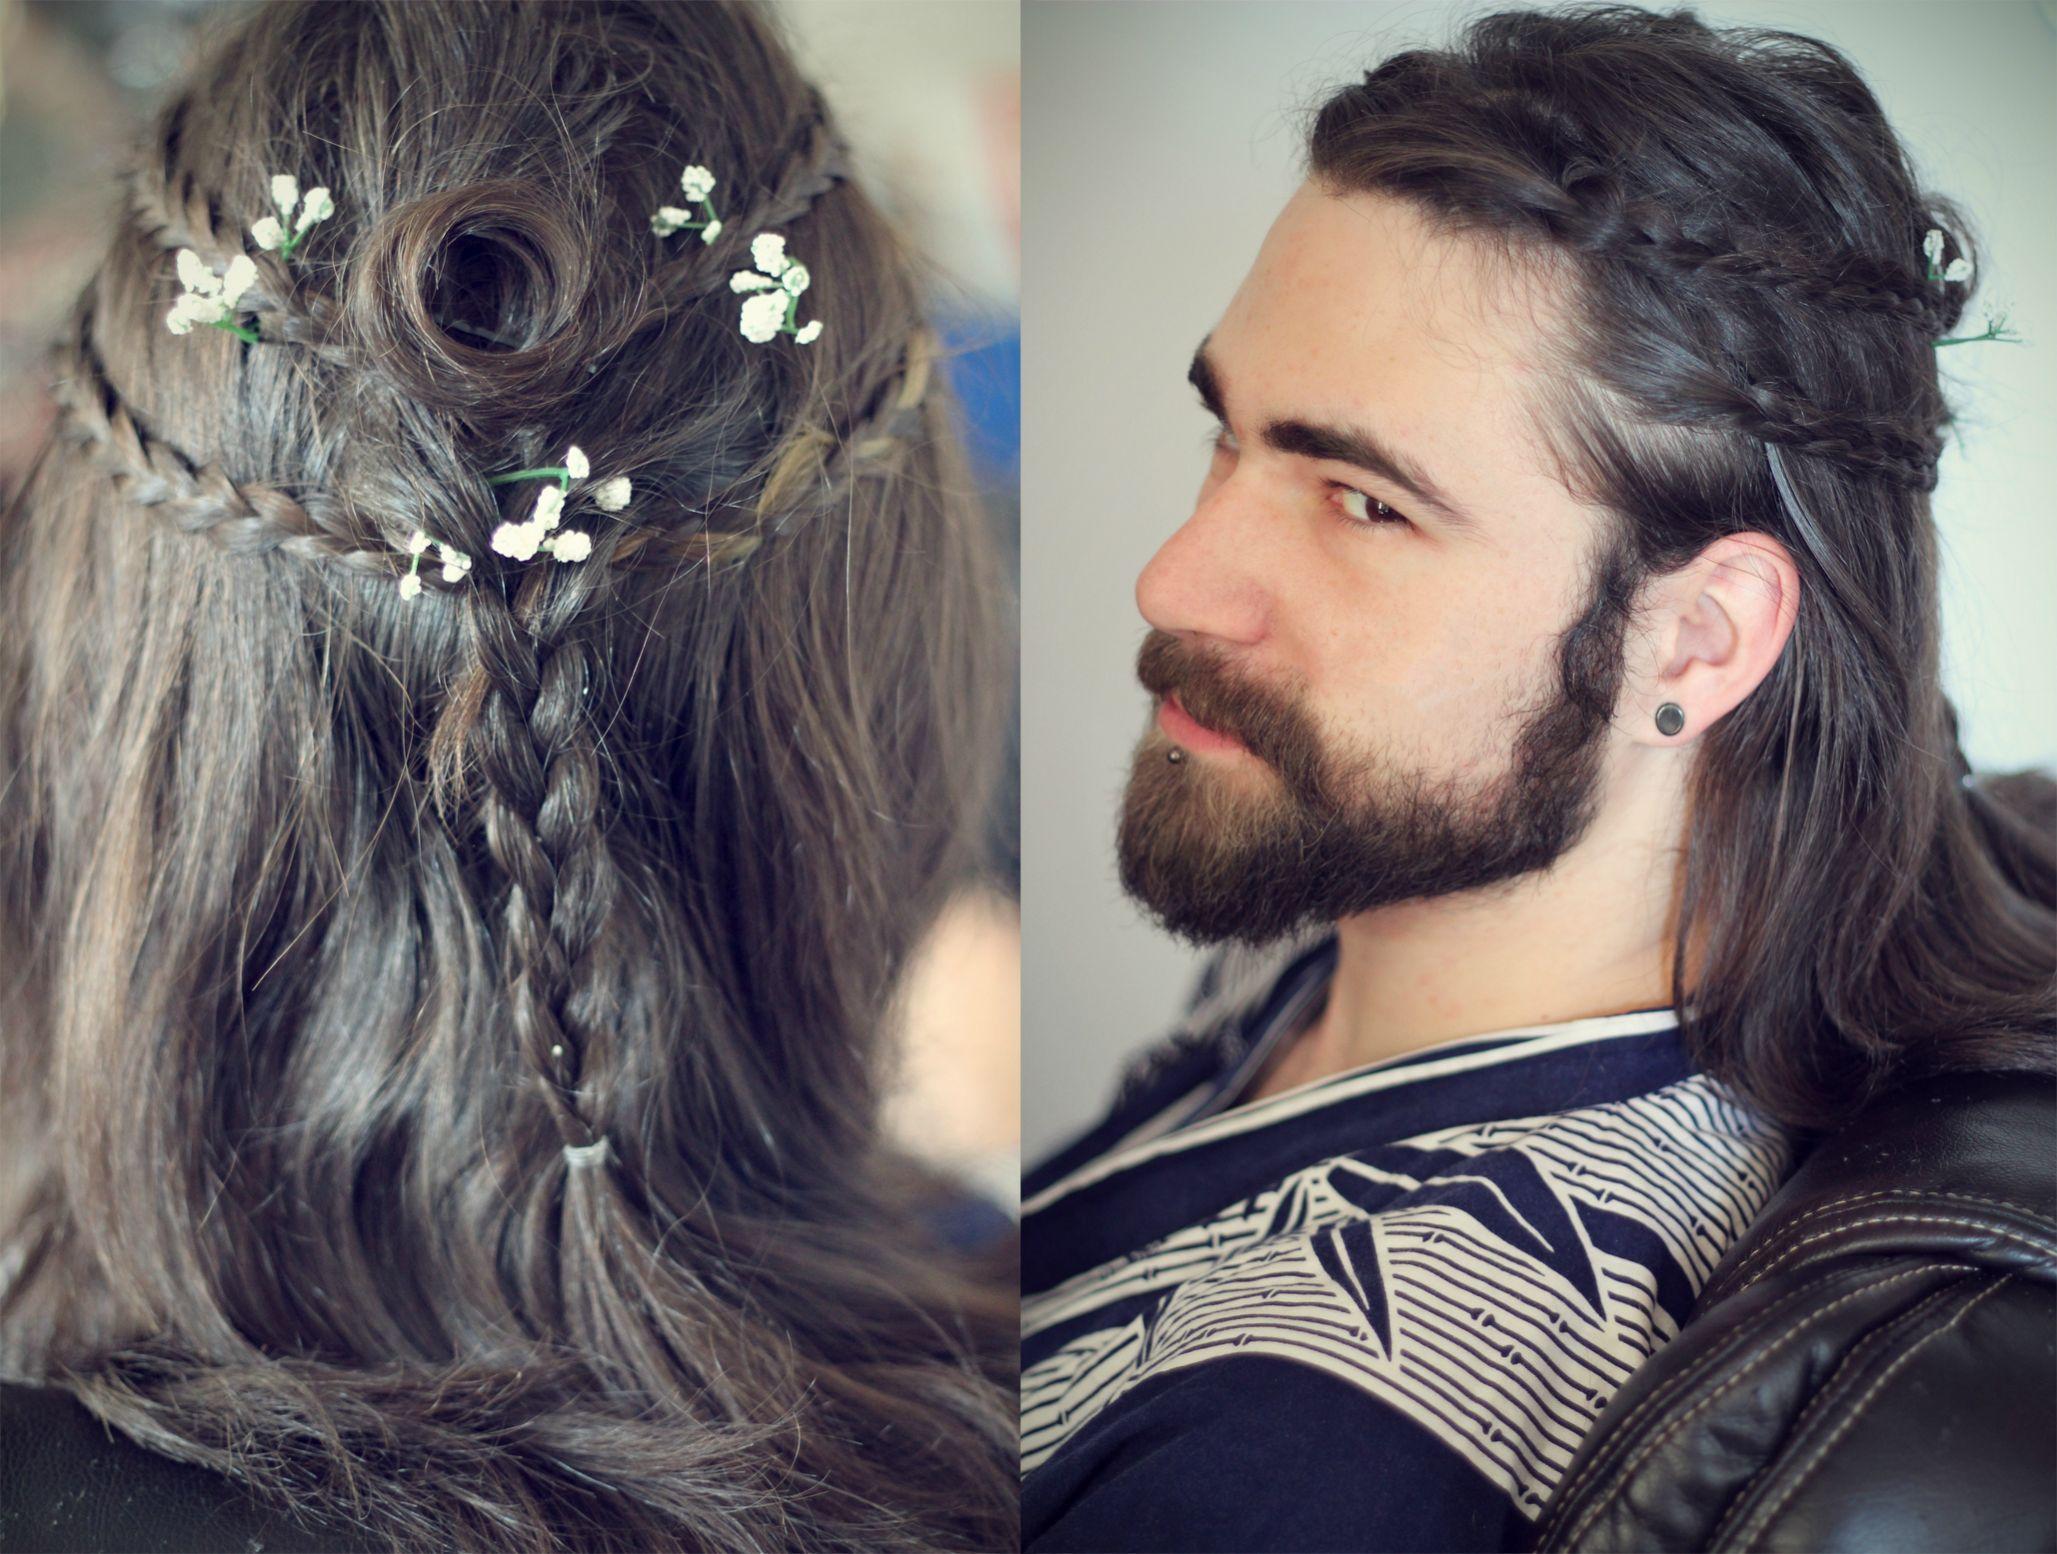 Men's Heroic Warrior Hairstyles – Gaelic Braids Gothic Samurai